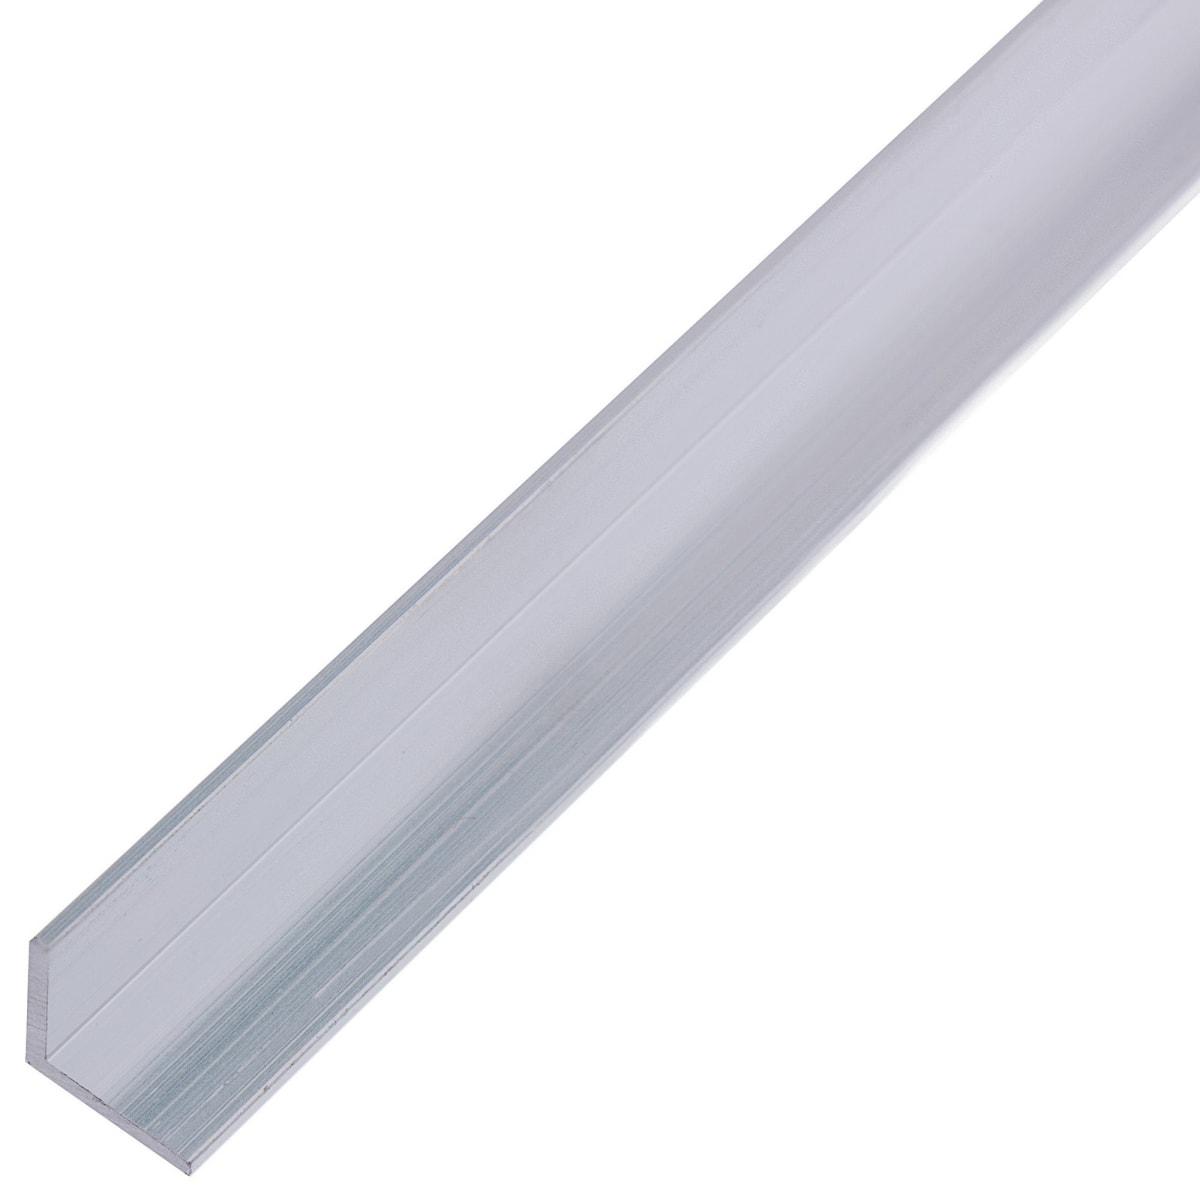 Профиль алюминиевый угловой 10х10х1.2x1000 мм